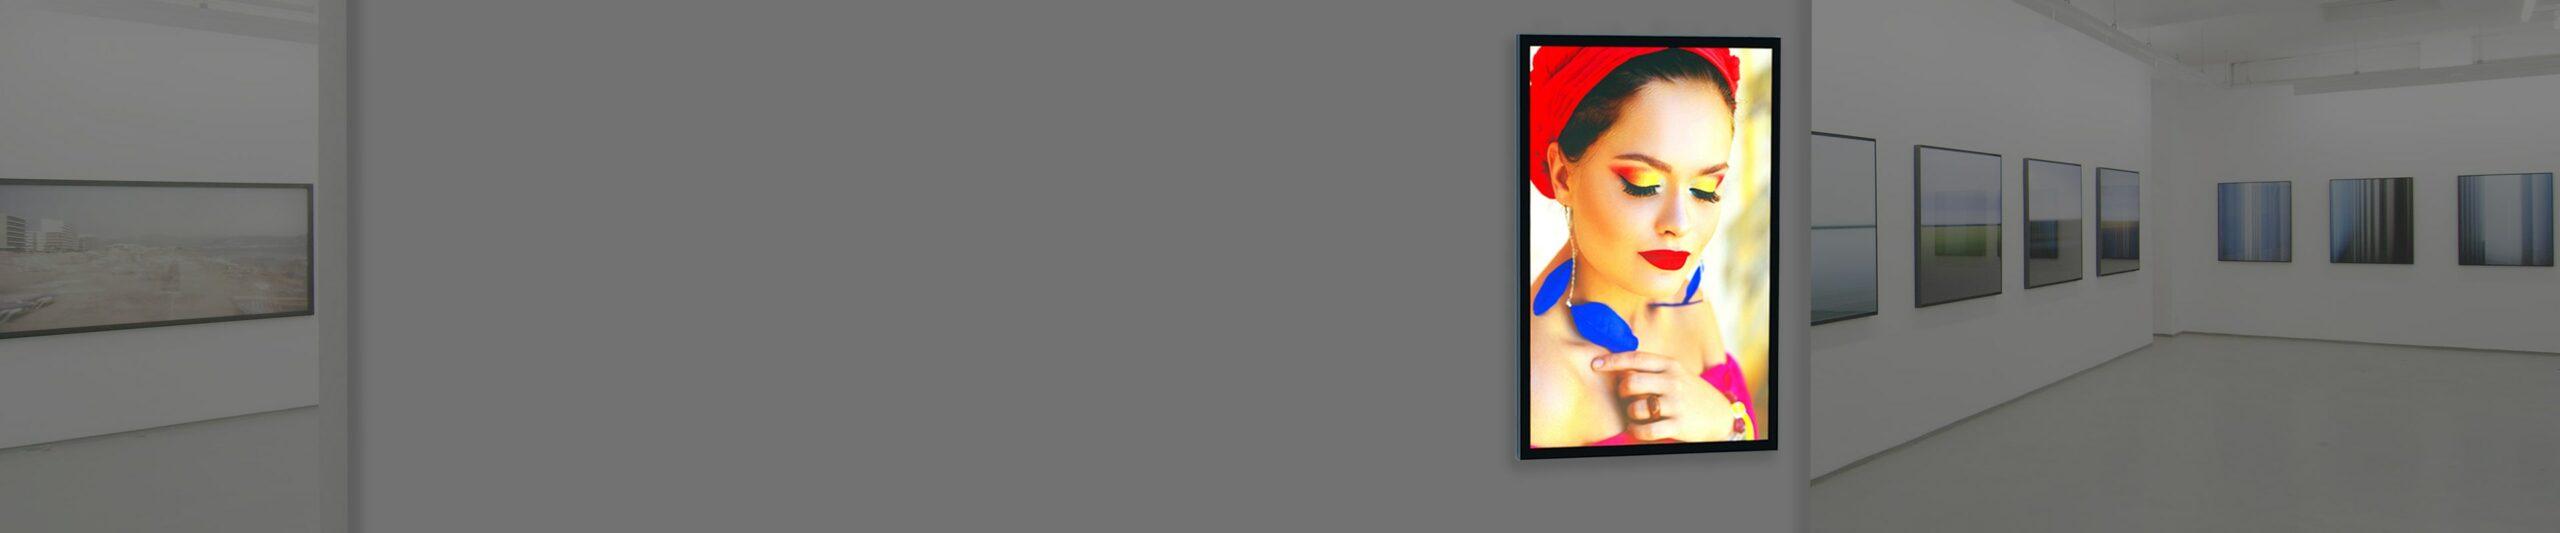 Large banner background image